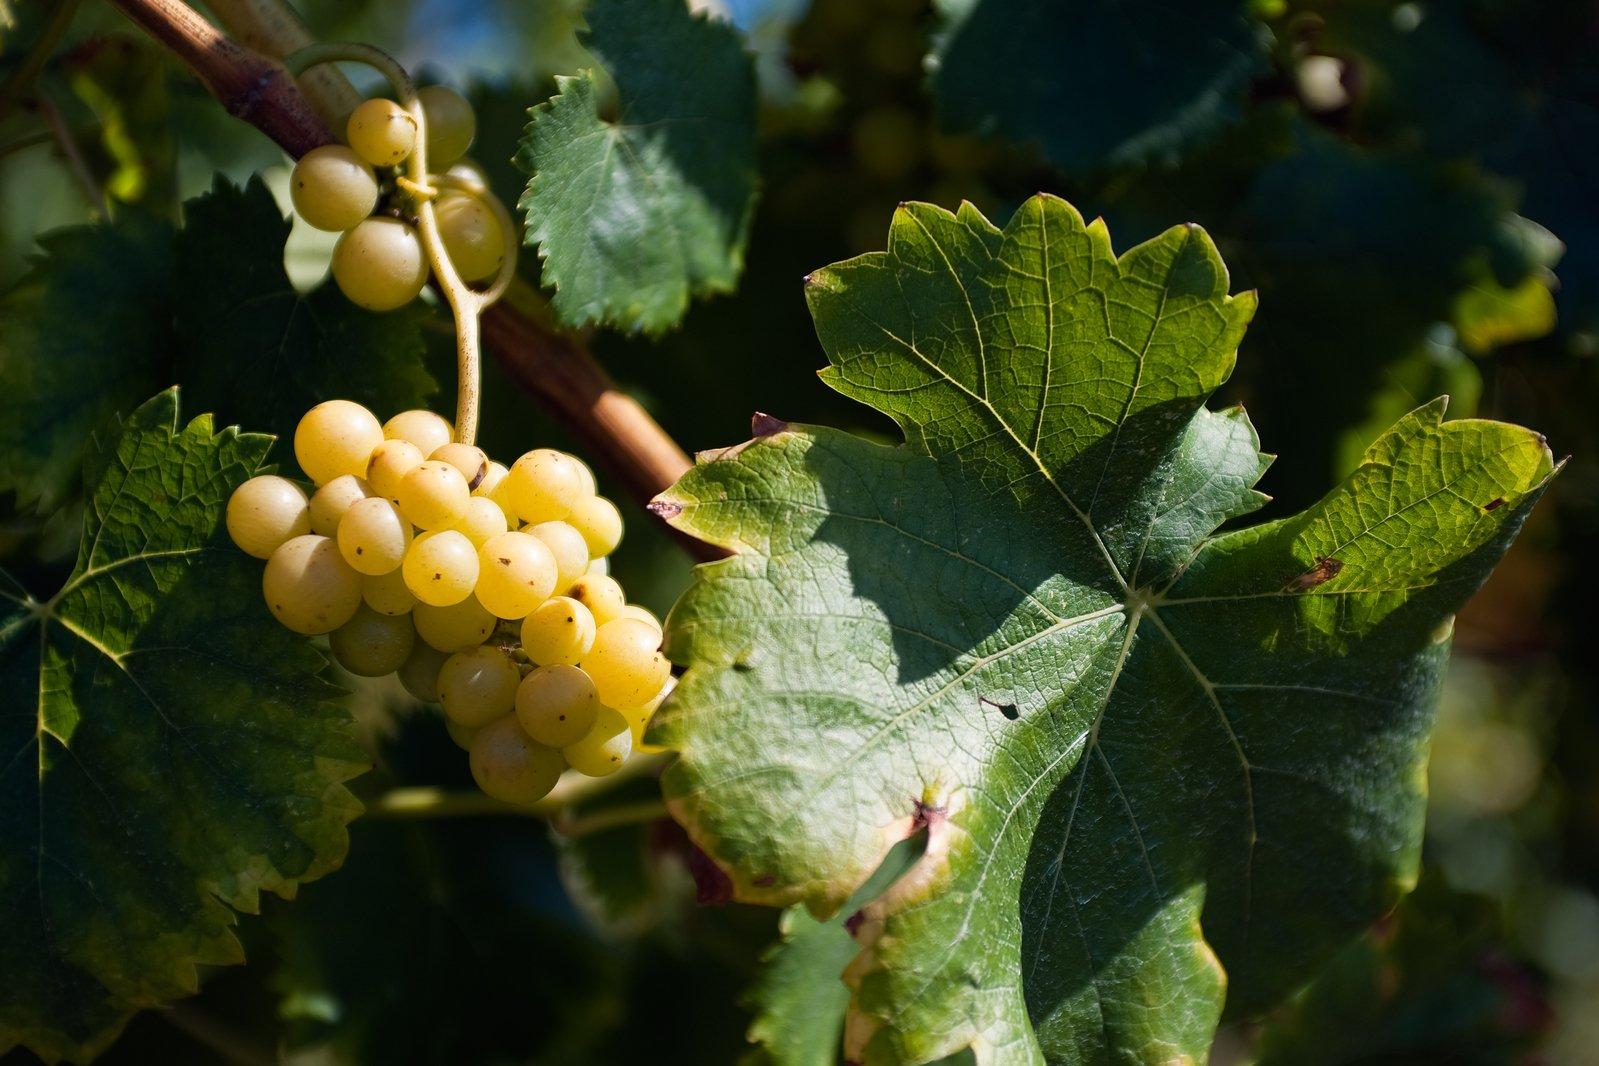 white-grapes-on-vine-1318682